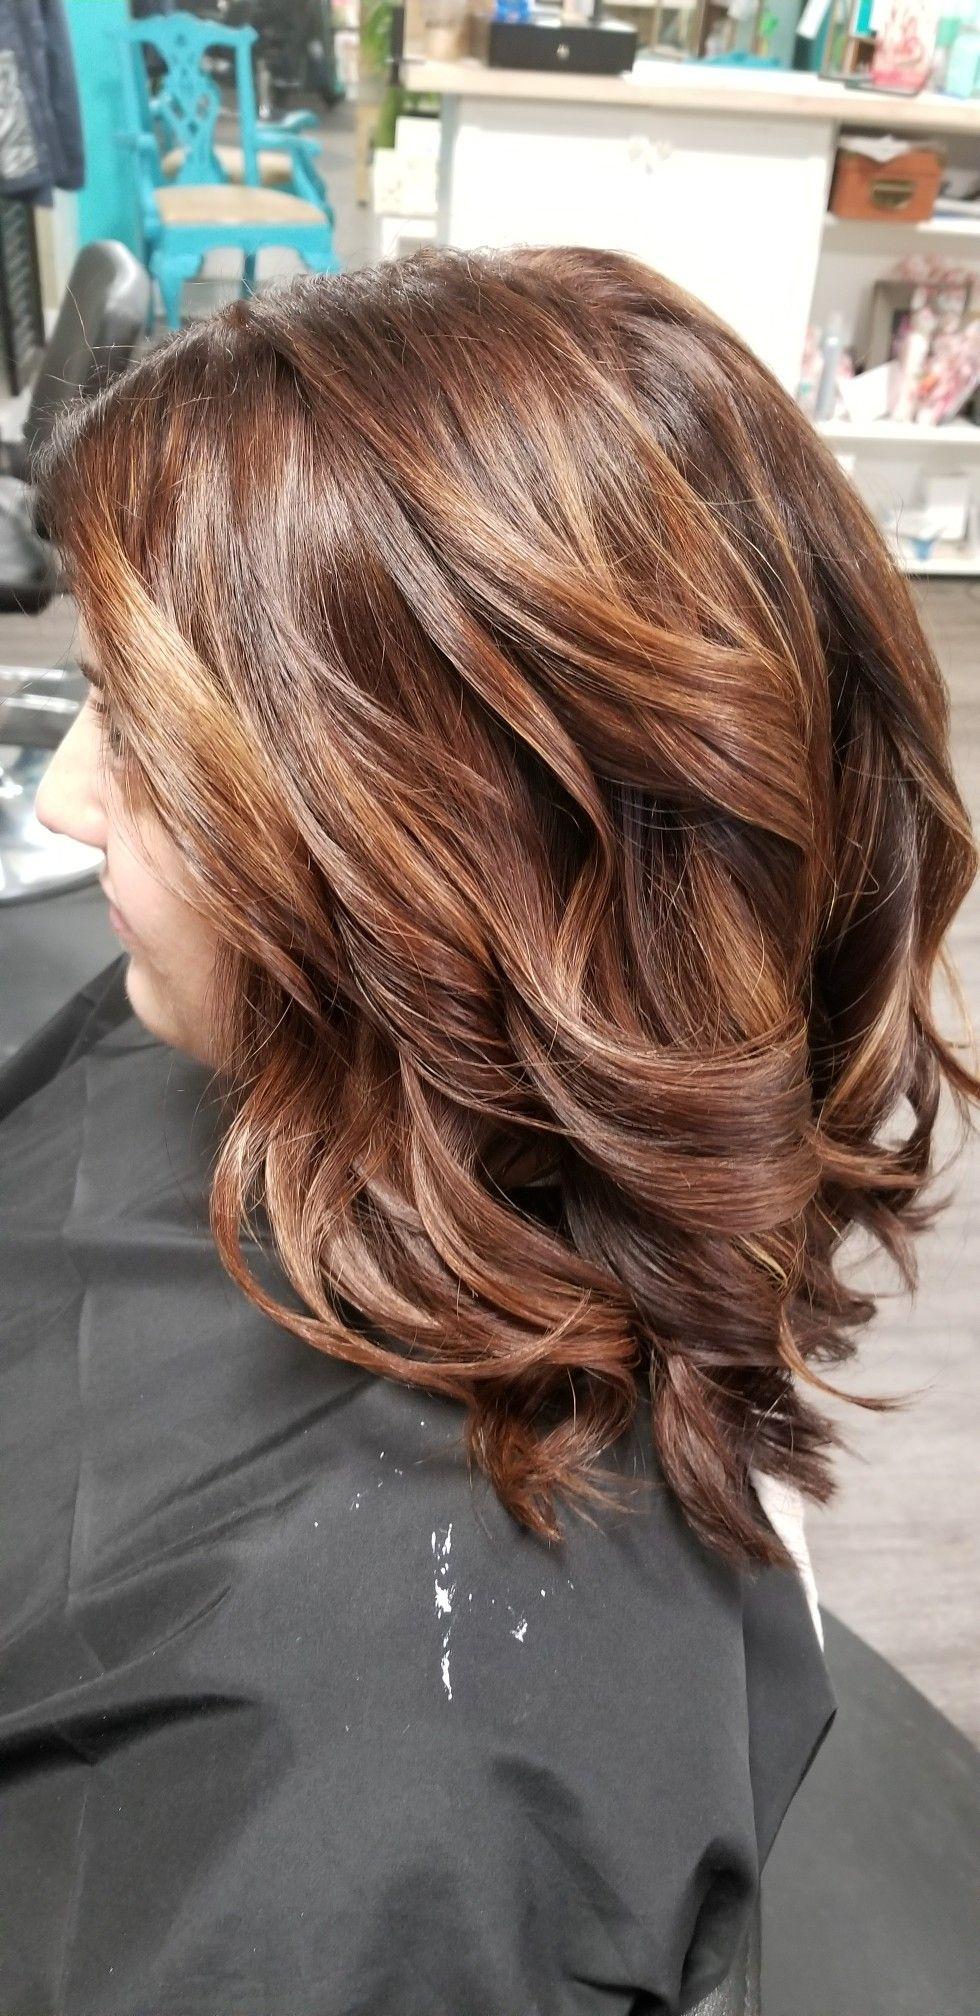 Chocolate Brown And Copper Color Melt Medium Length Hair Lose Curls Medium Length Hair Styles Curled Hairstyles For Medium Hair Medium Hair Styles